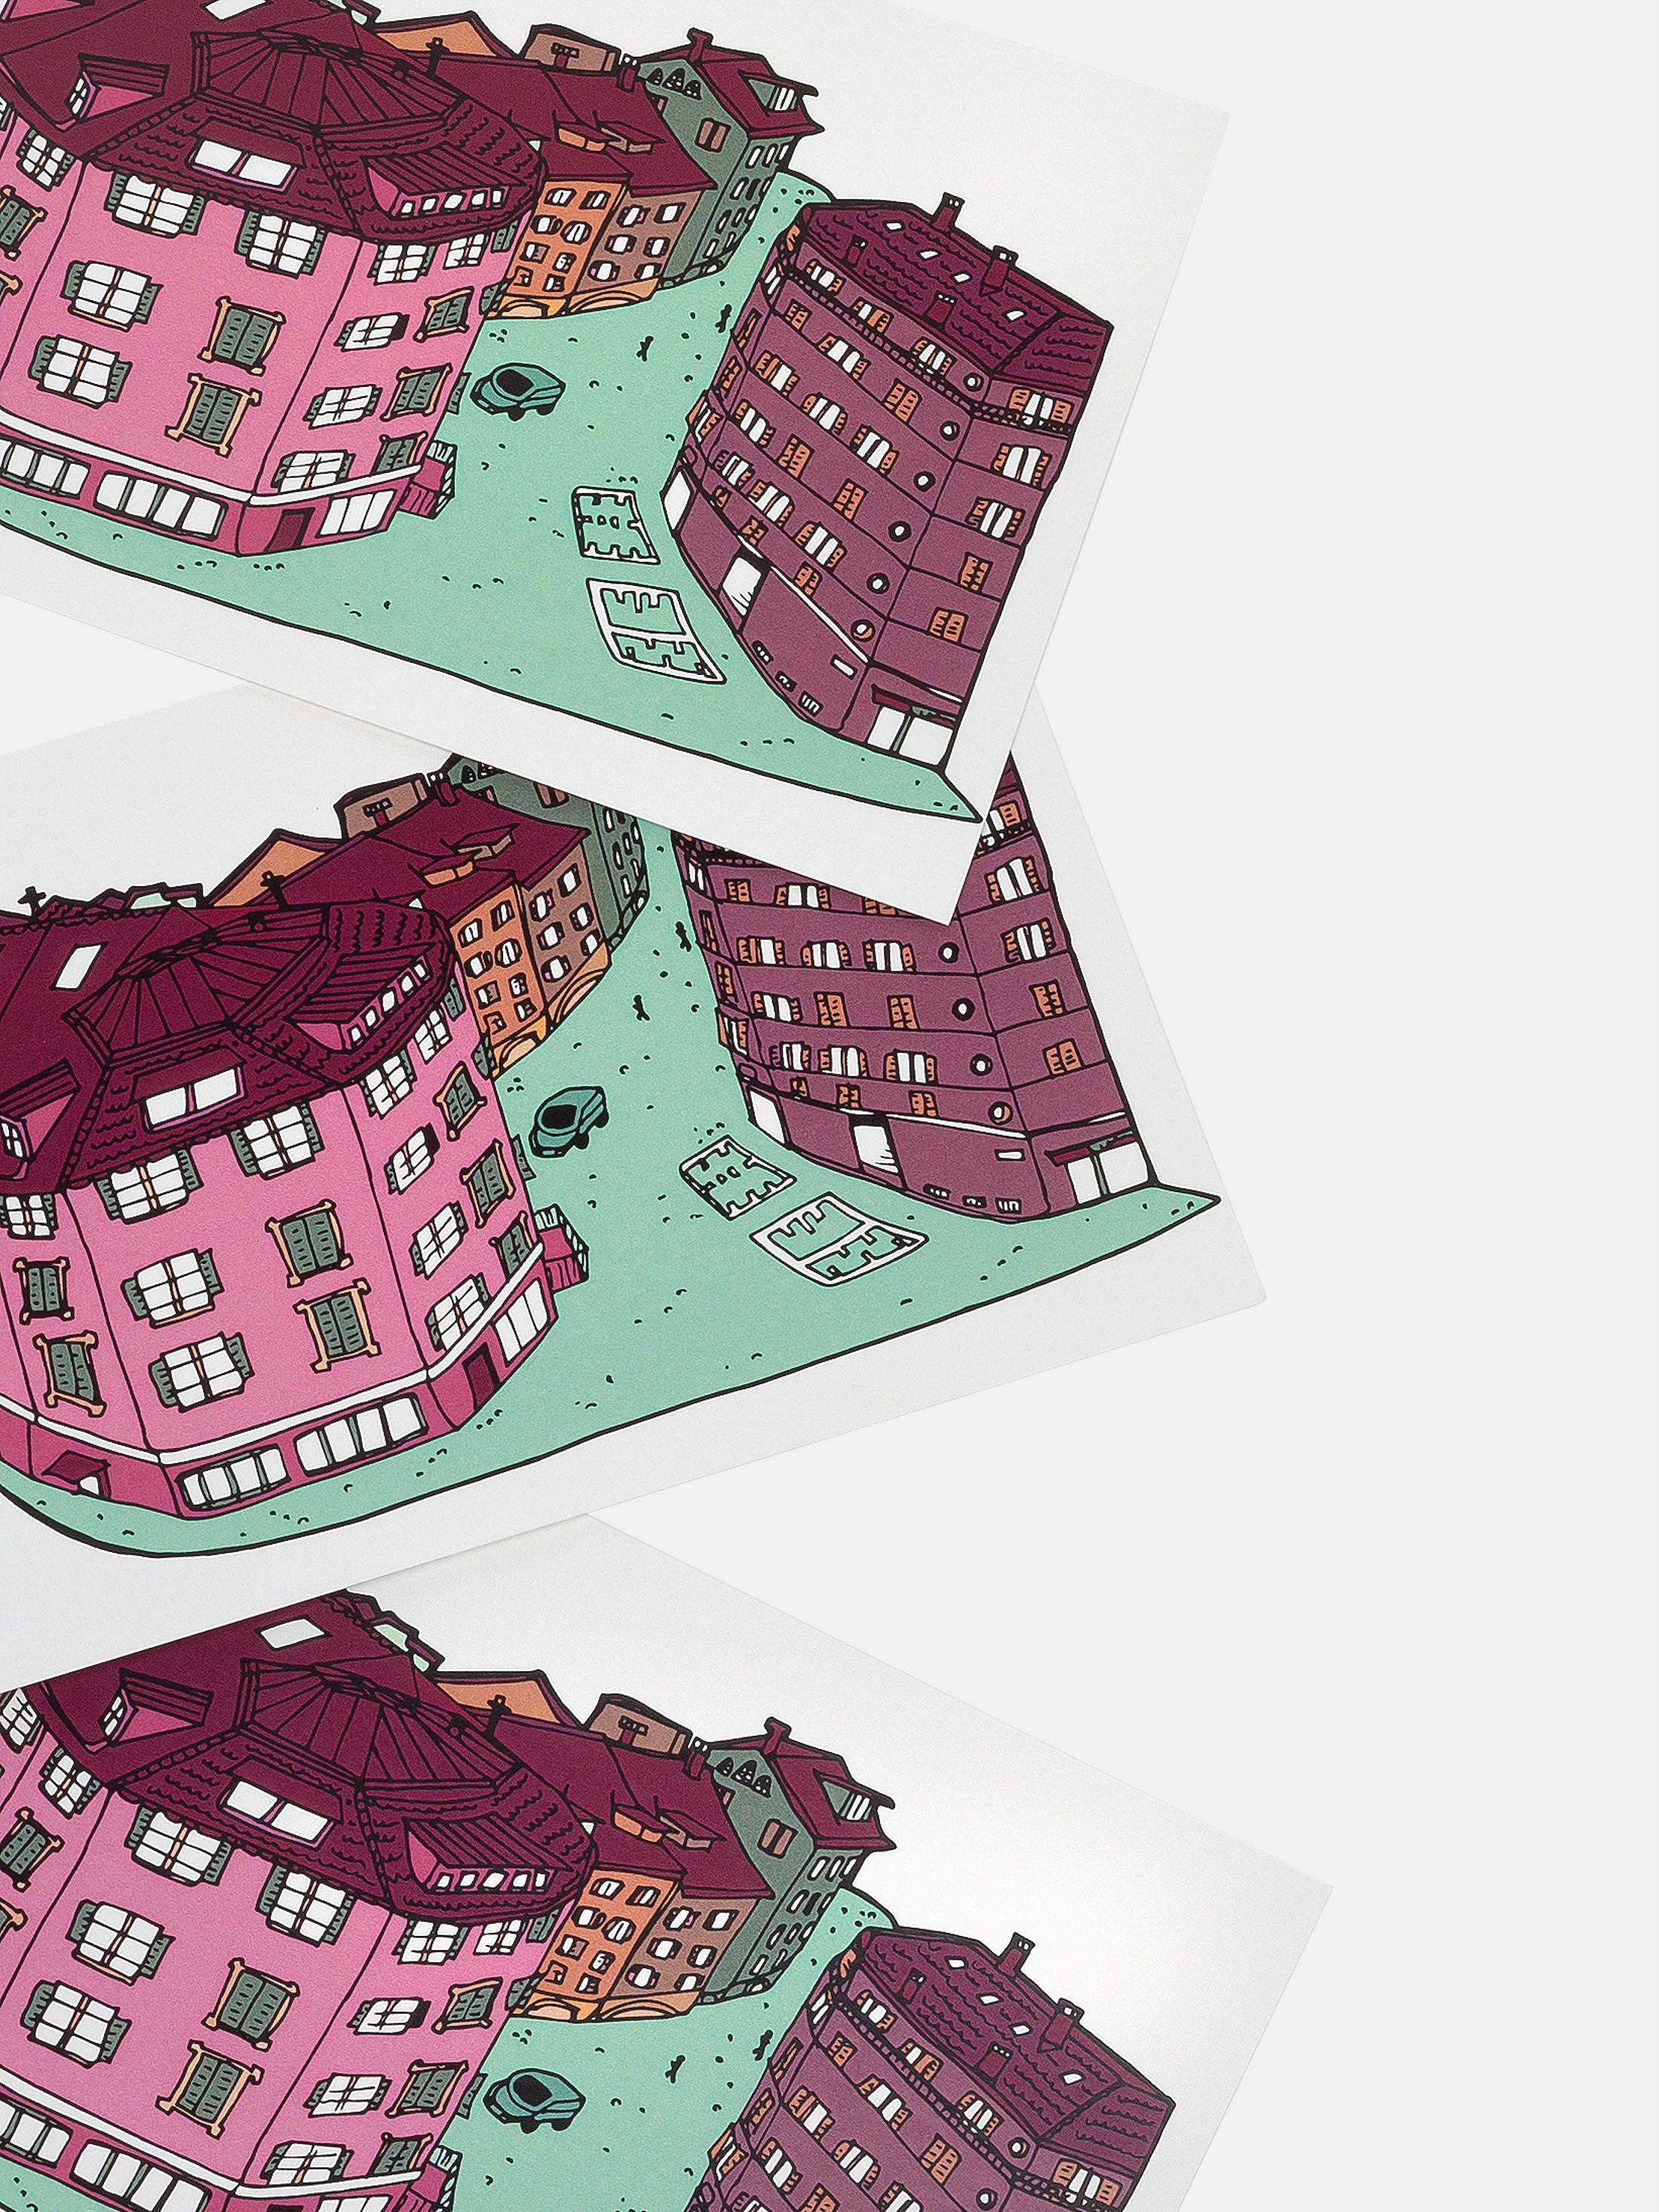 postcards custom printed with bespoke art